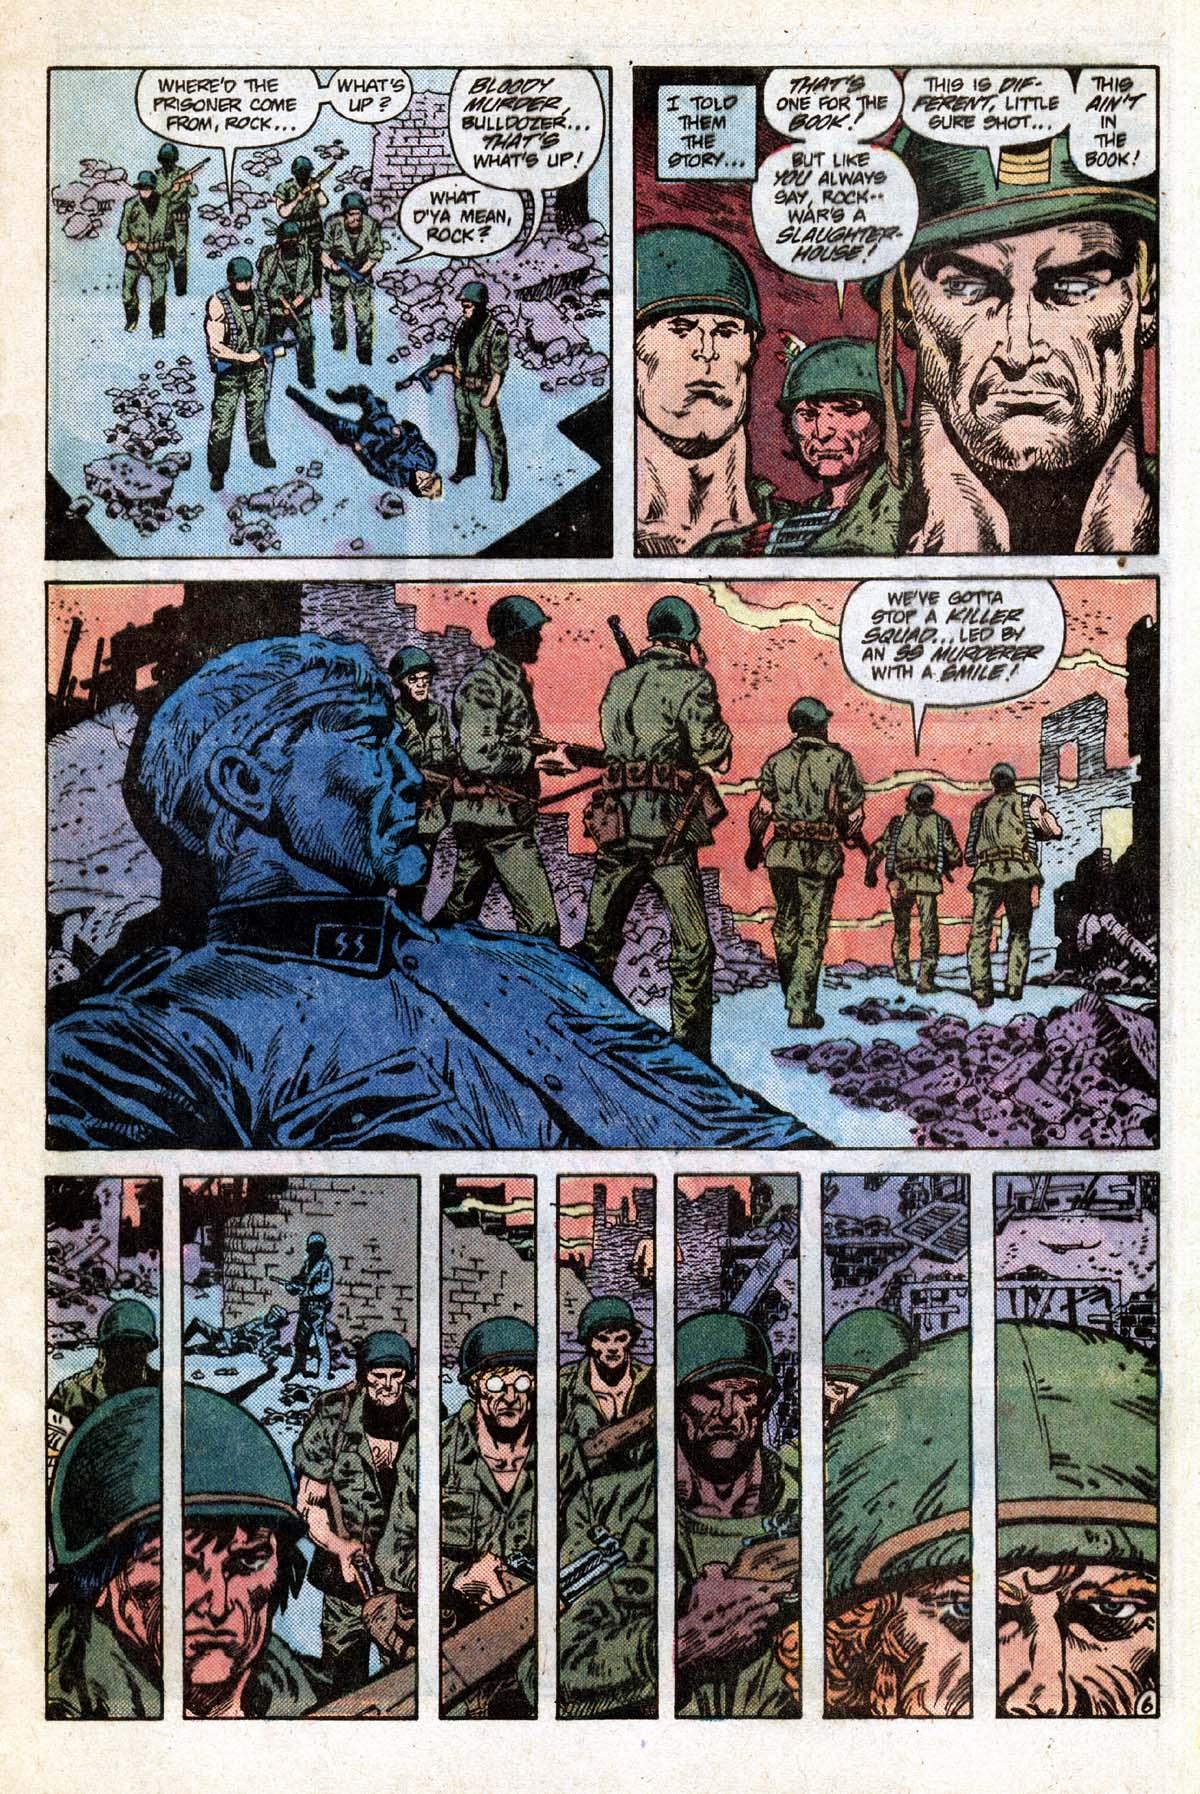 Read online Sgt. Rock comic -  Issue #391 - 7